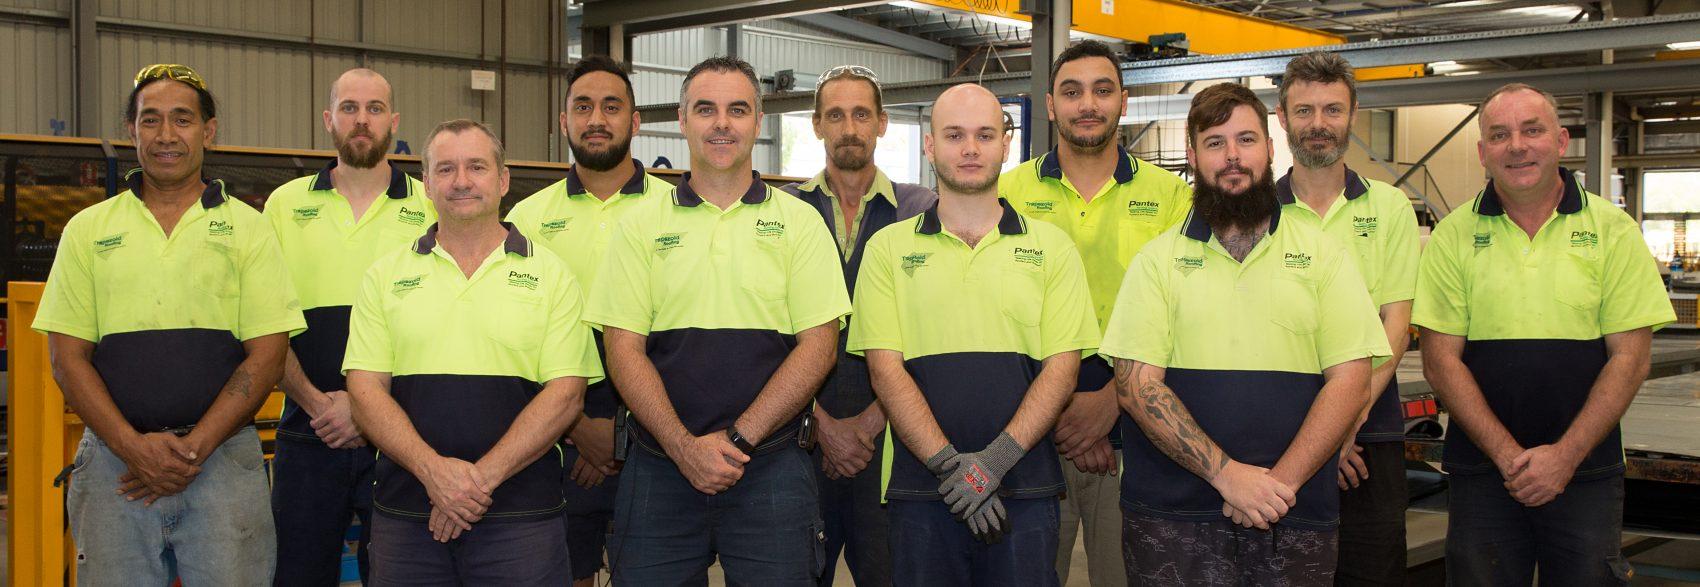 Pantex Manufacturing Team